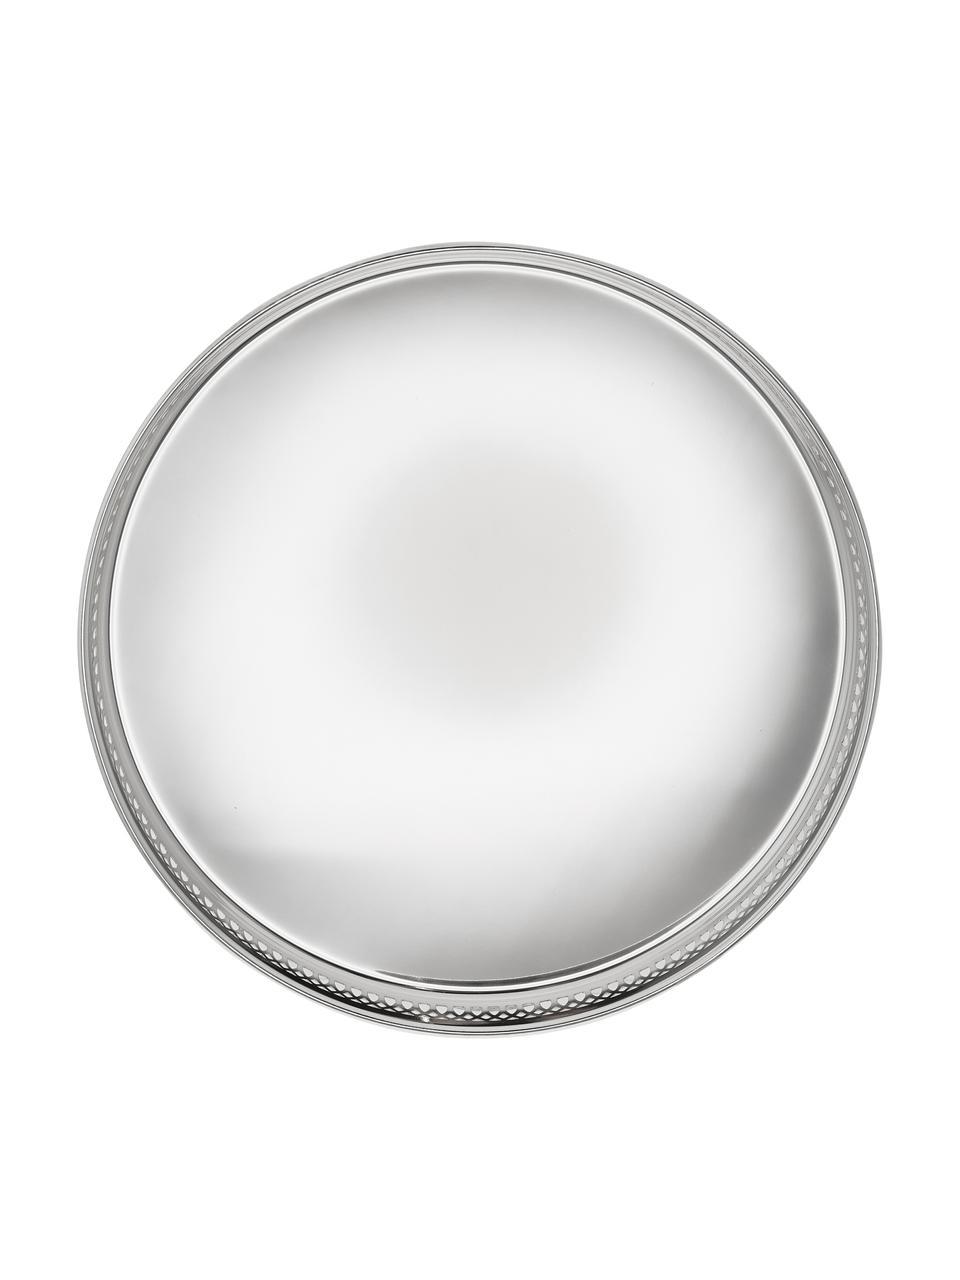 Vassoio rotondo a specchio Delphi, Acciaio argentato, Argento, Ø 30 cm